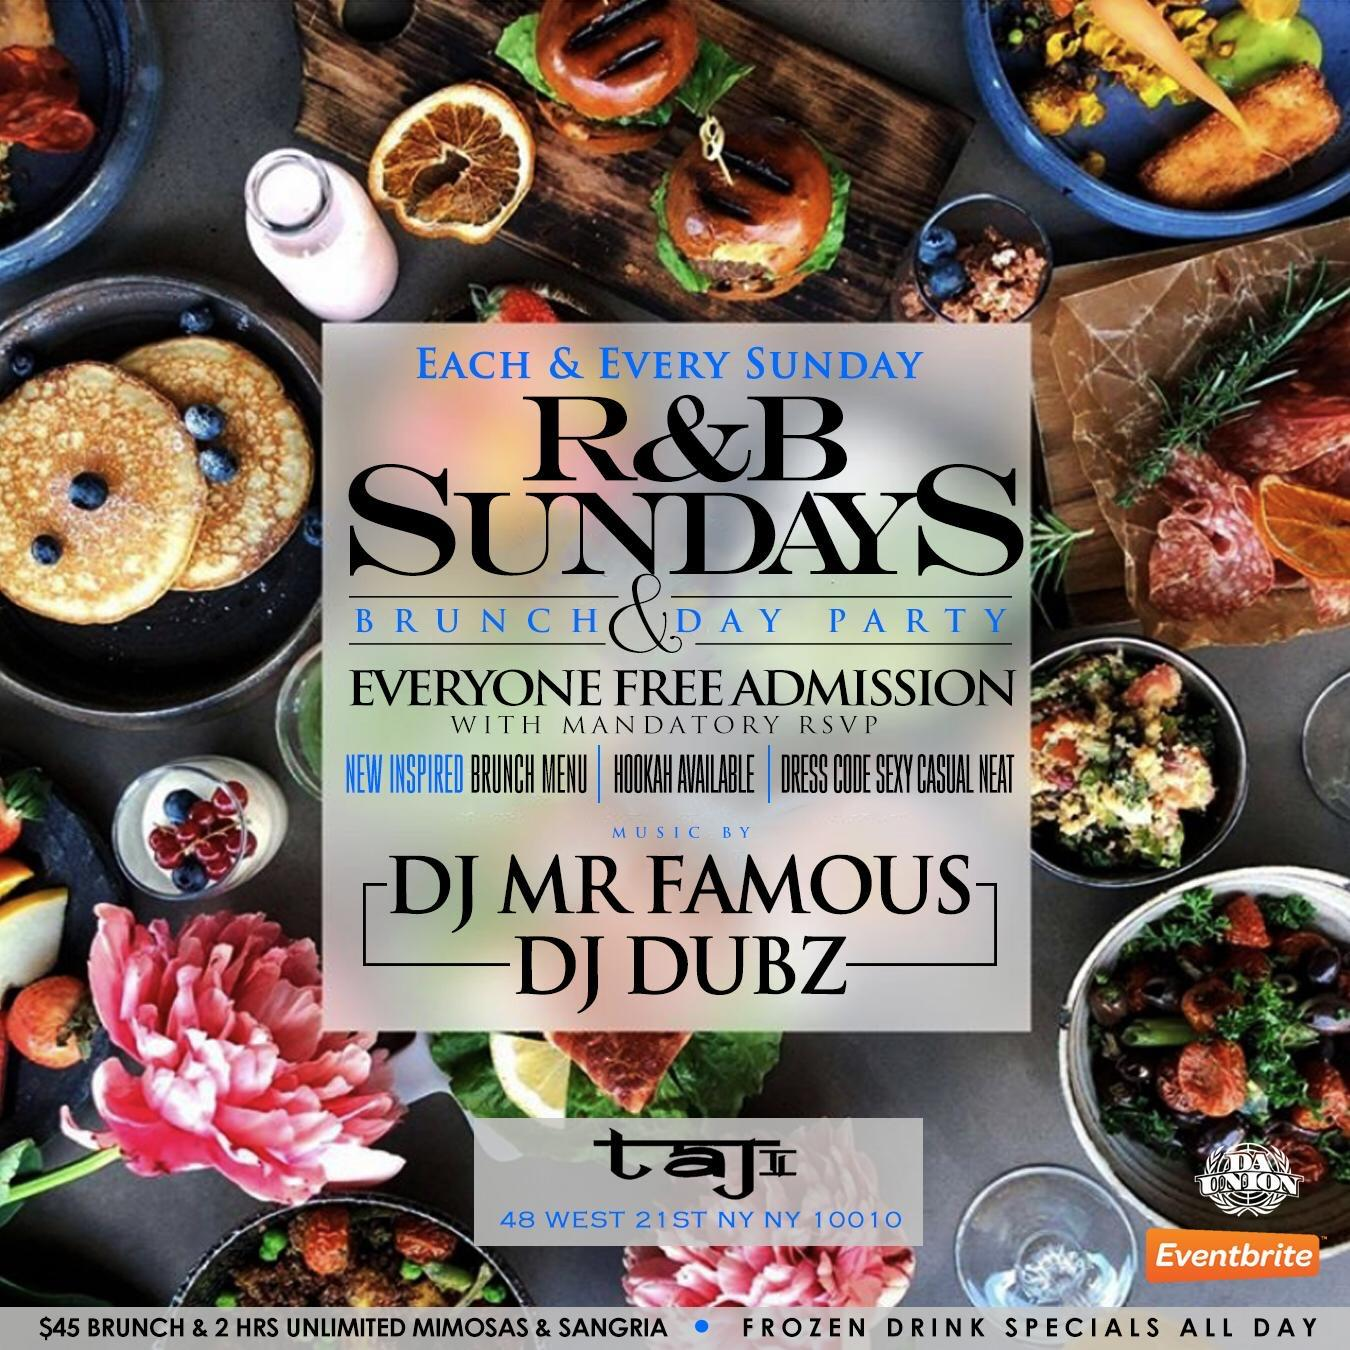 Sun. 09/20: #1 R&B Sundays Bottomless Brunch Party at TaJ NYC. RSVP NOW